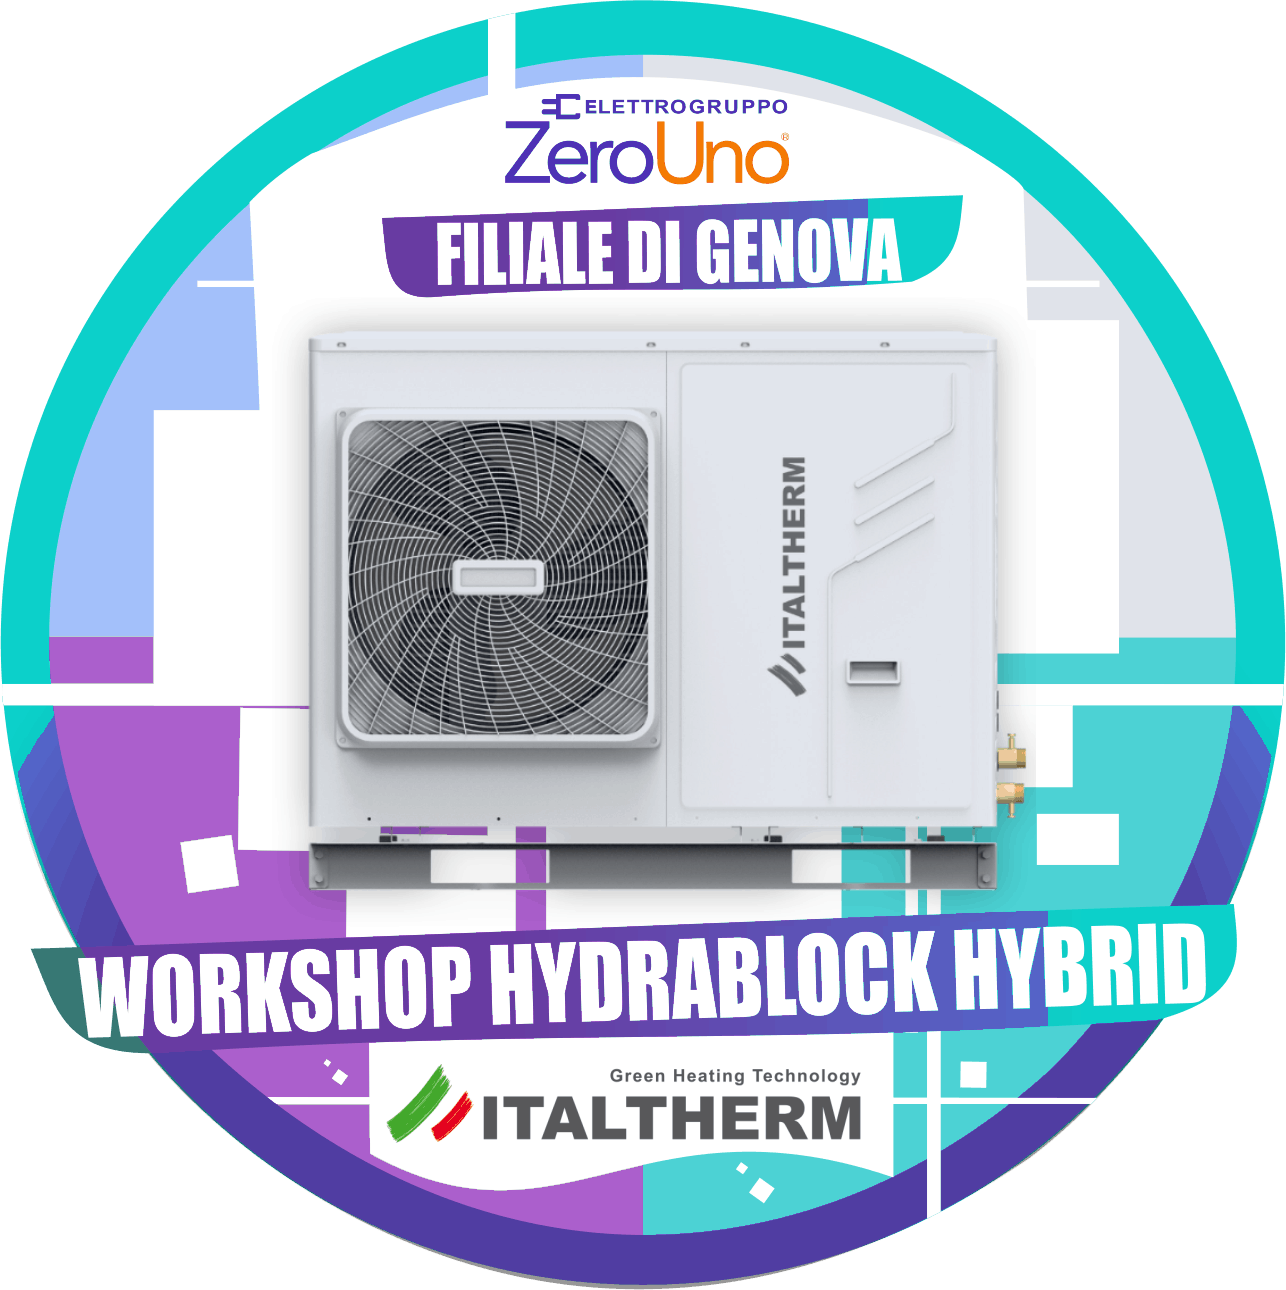 Workshop Italtherm 30 Luglio Genova   Elettrogruppo ZeroUno  To    IMMAGINE PRINCIPALE WORKSHOP GENOVA